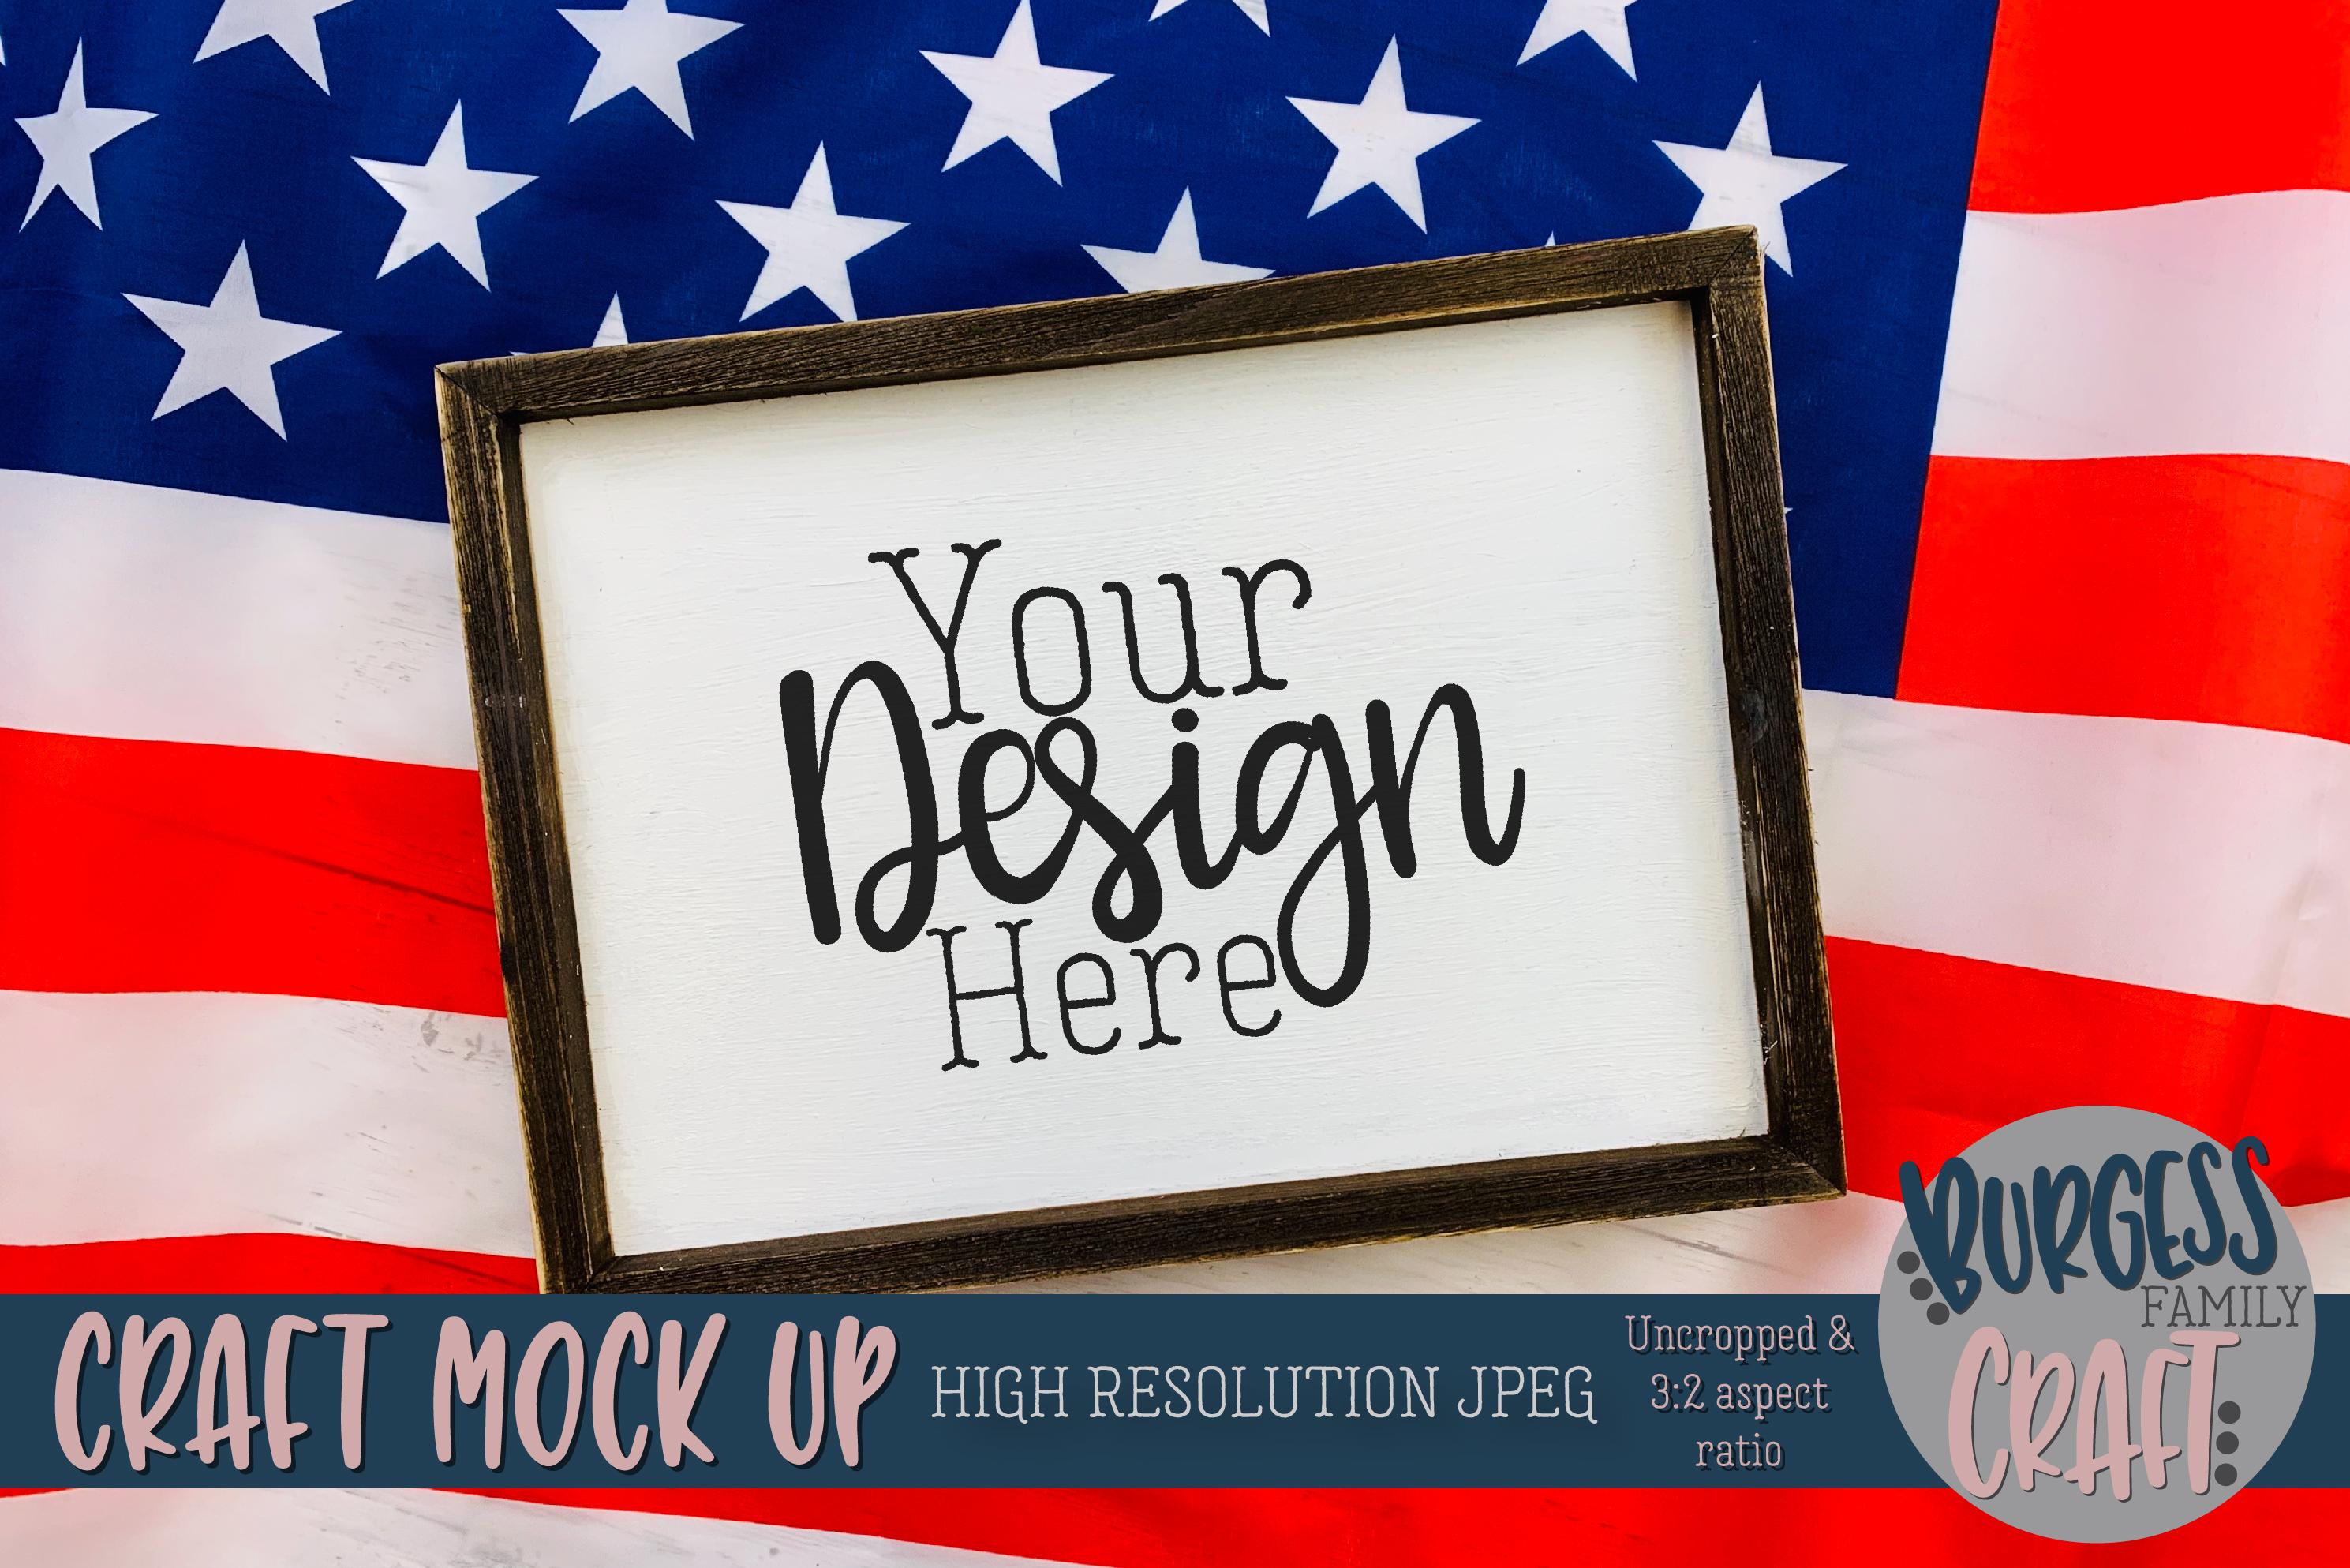 Patriotic USA landscape sign Craft mock up | High Res JPG example image 1